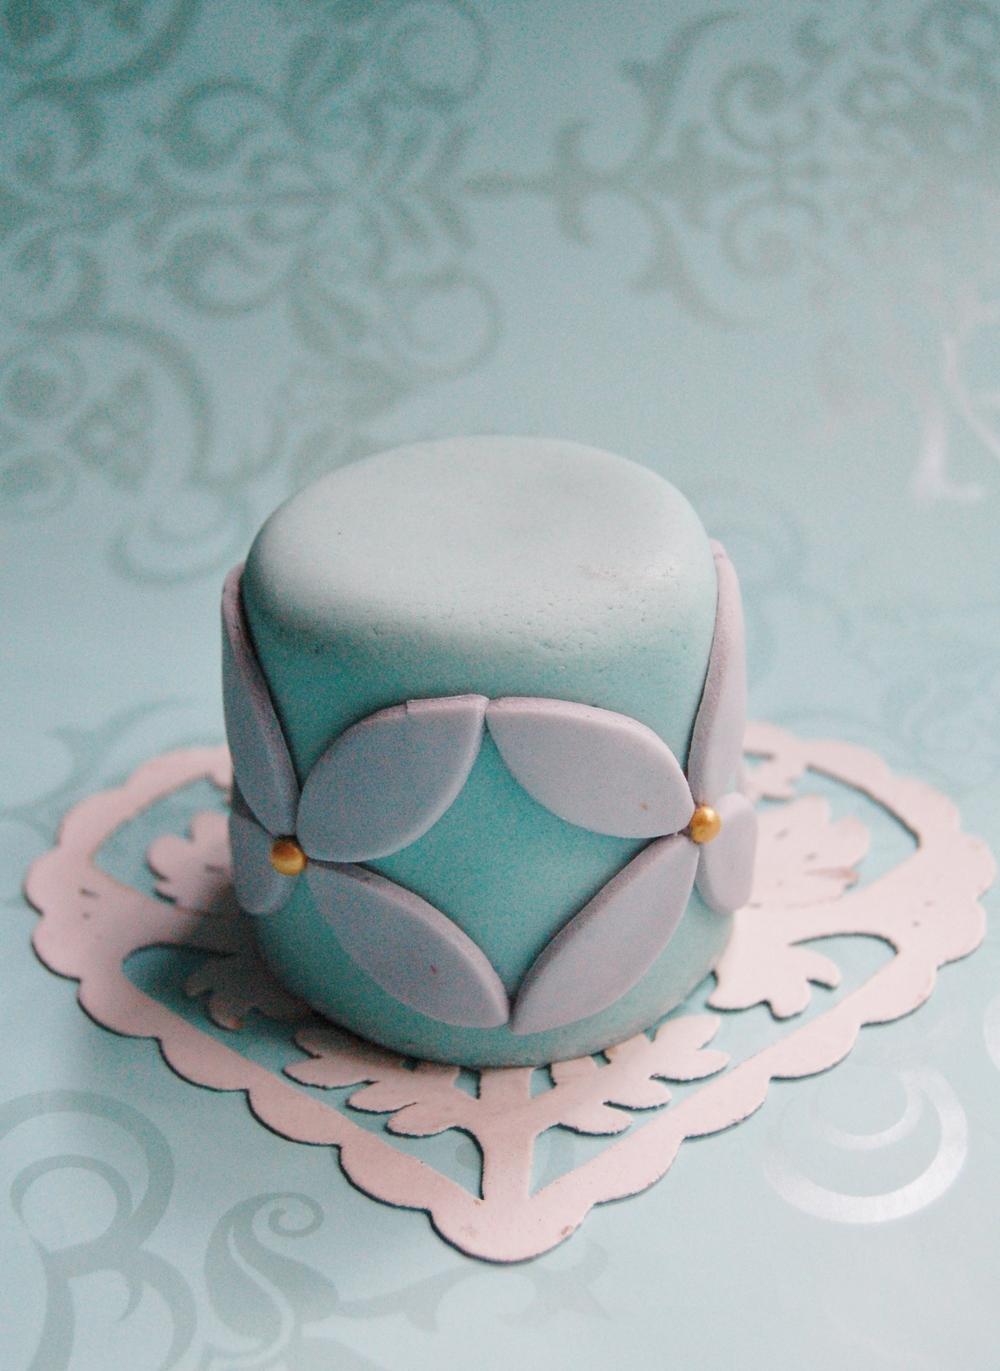 new cakes 011.jpg